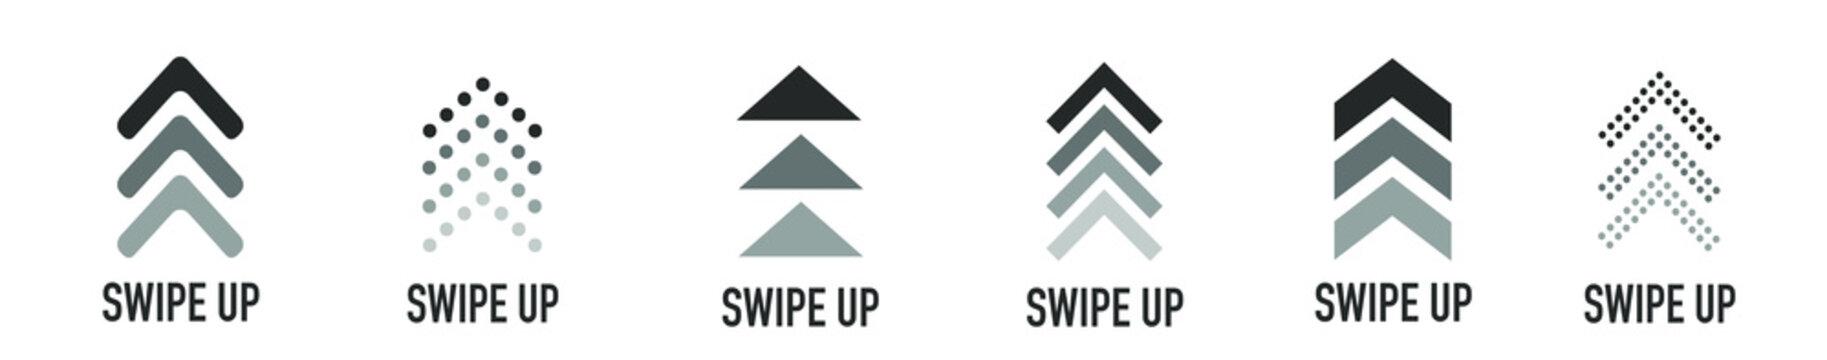 Swipe up buttons set for social media. Flat design icons on white. Vector illustration